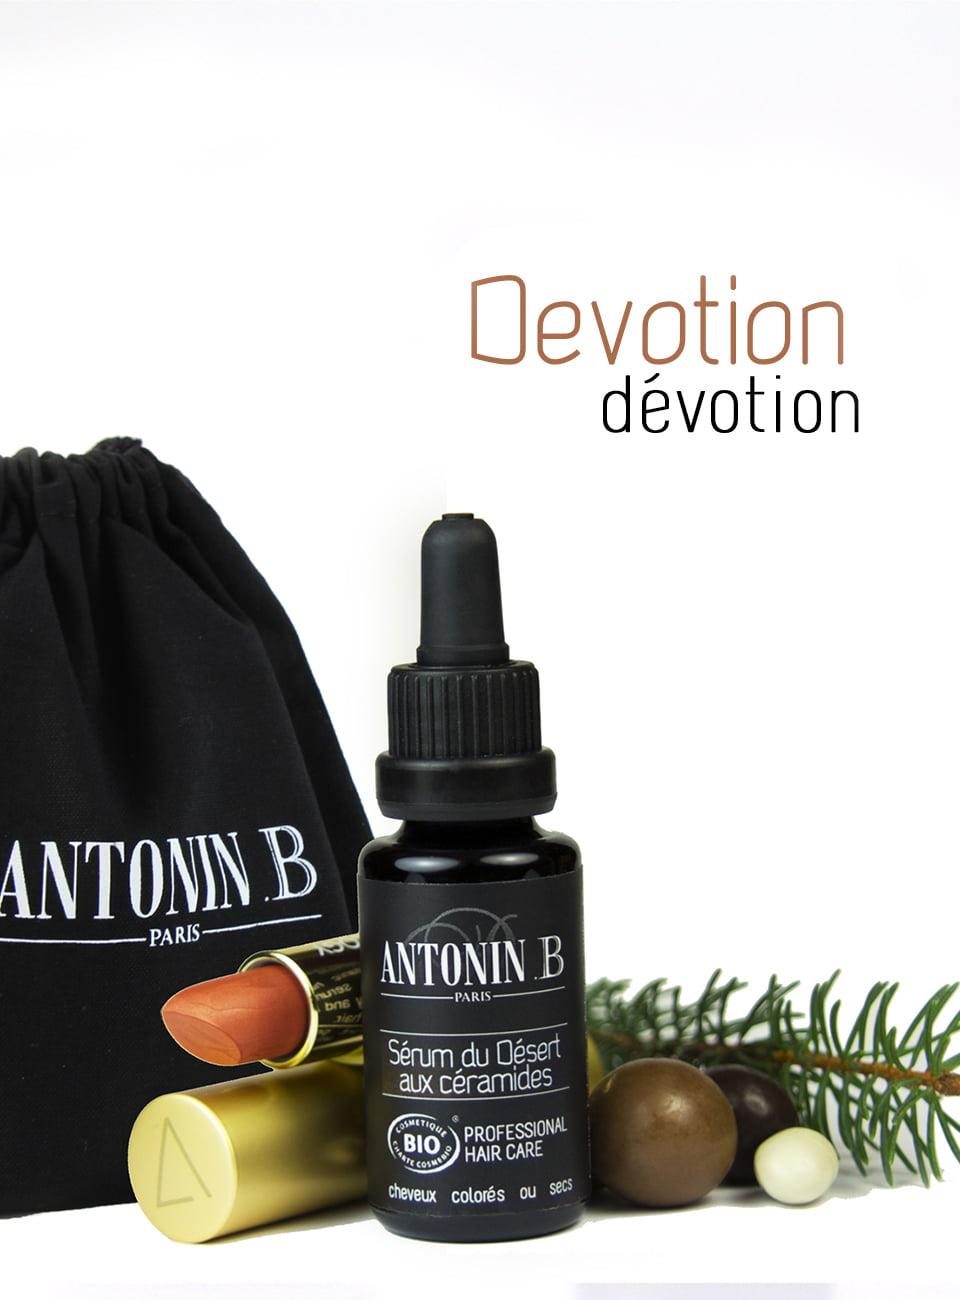 Christmas gift set: Organic & vegan beauty gift box